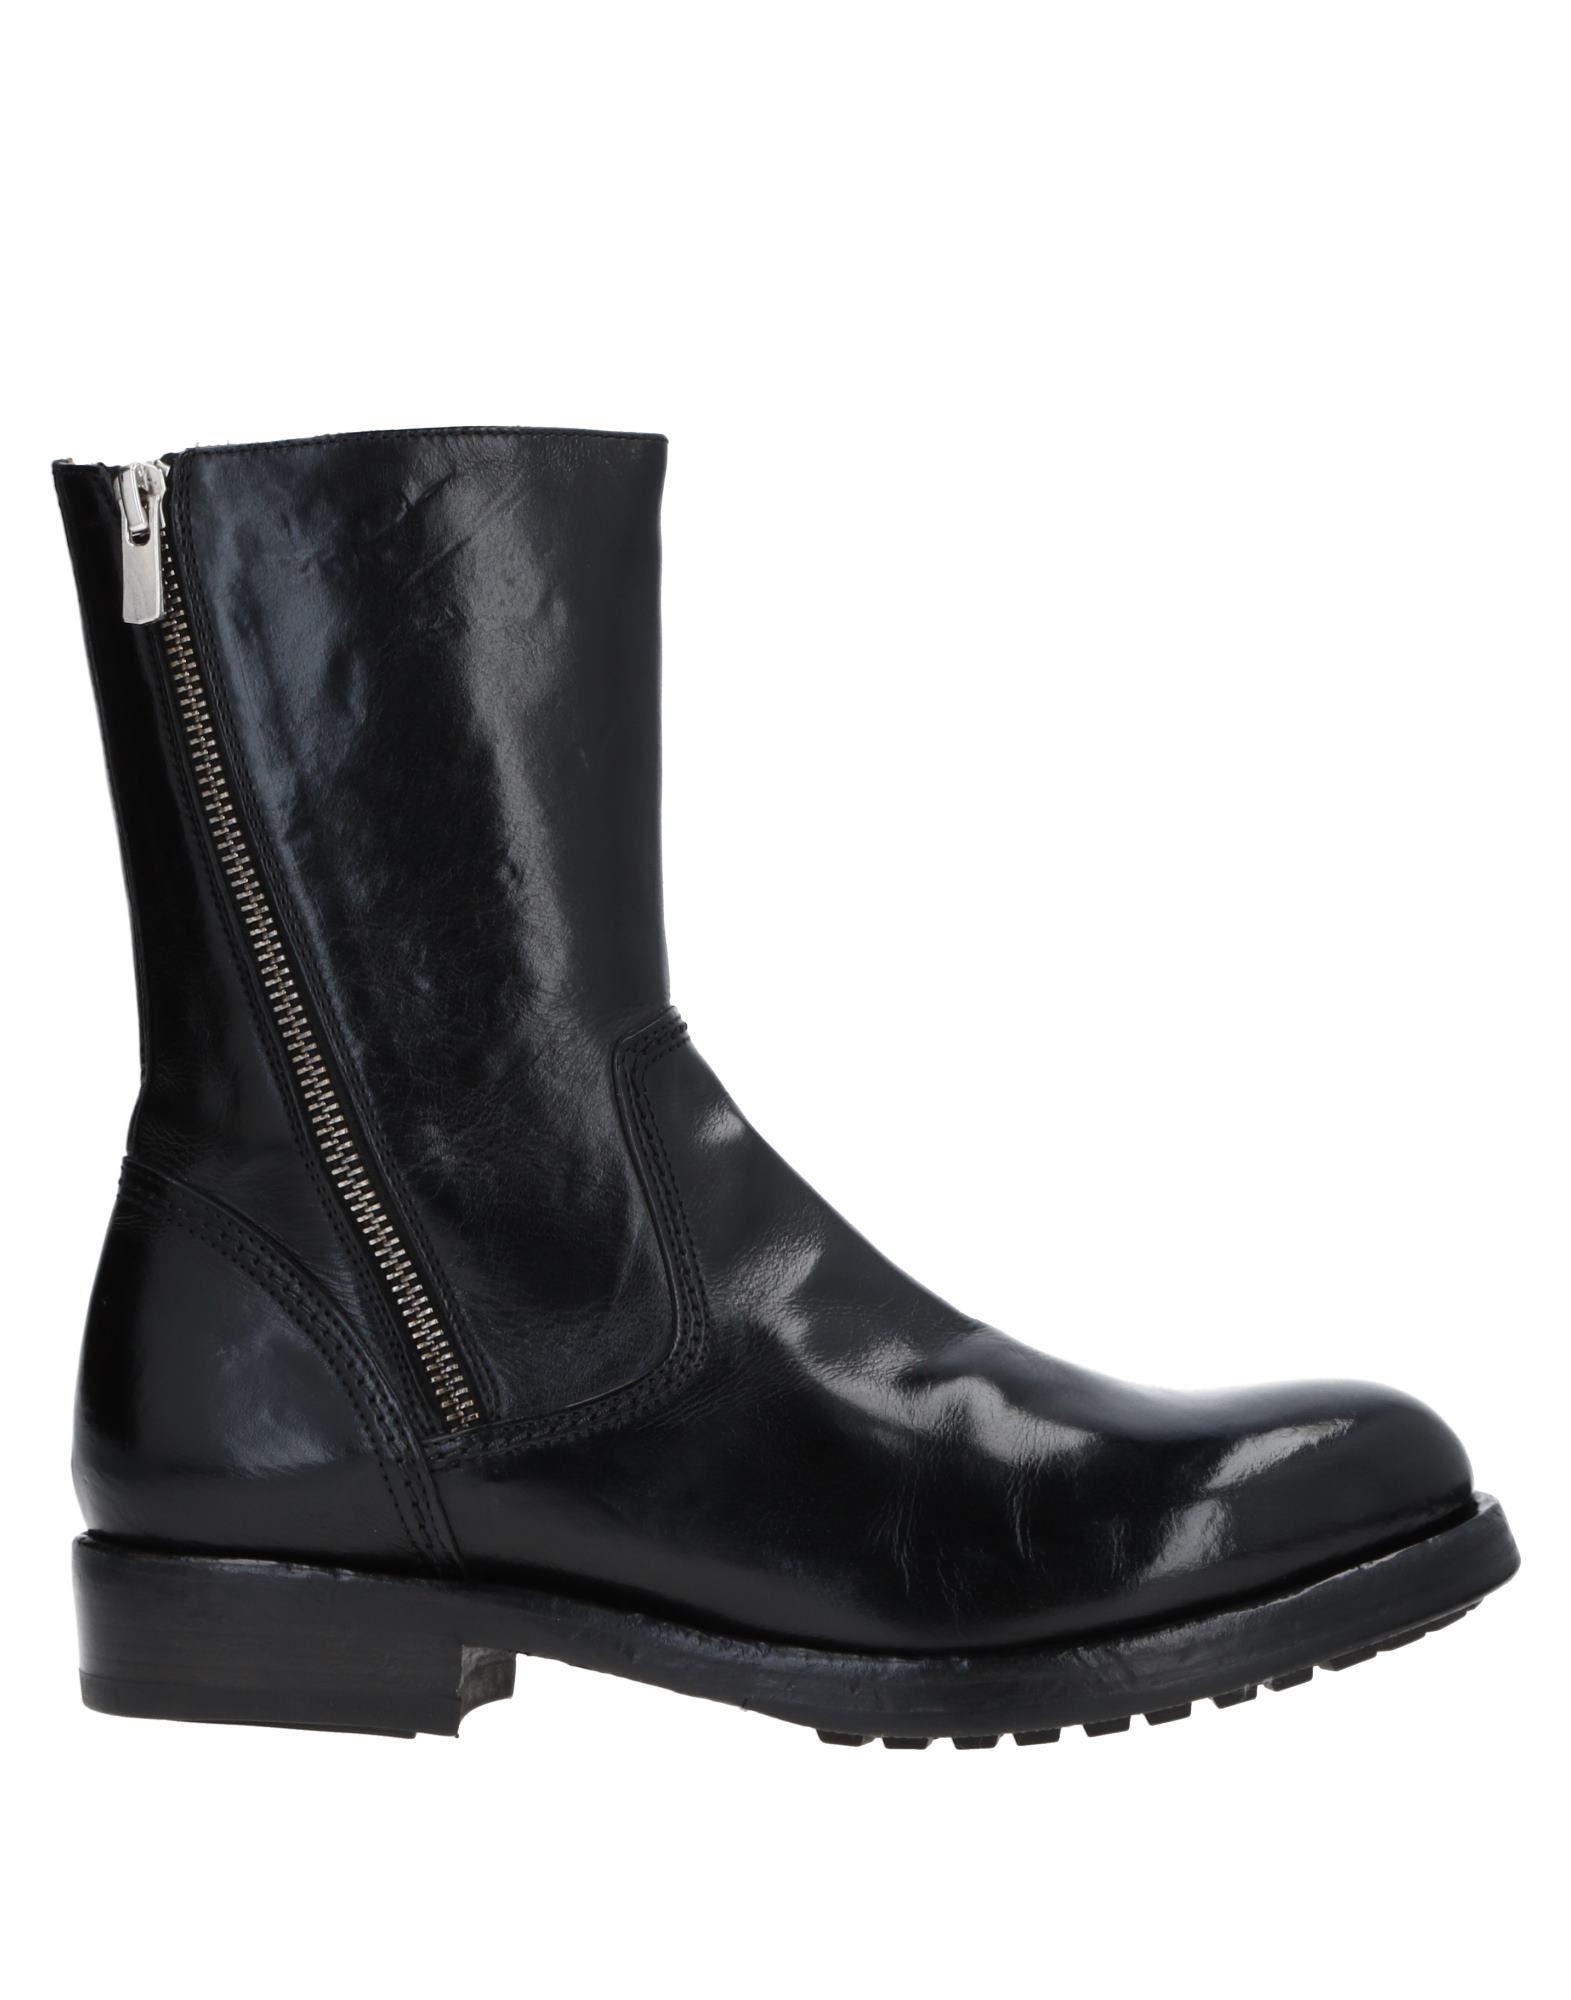 Officine Creative Italia Stiefelette Damen  11516848FV Neue Schuhe